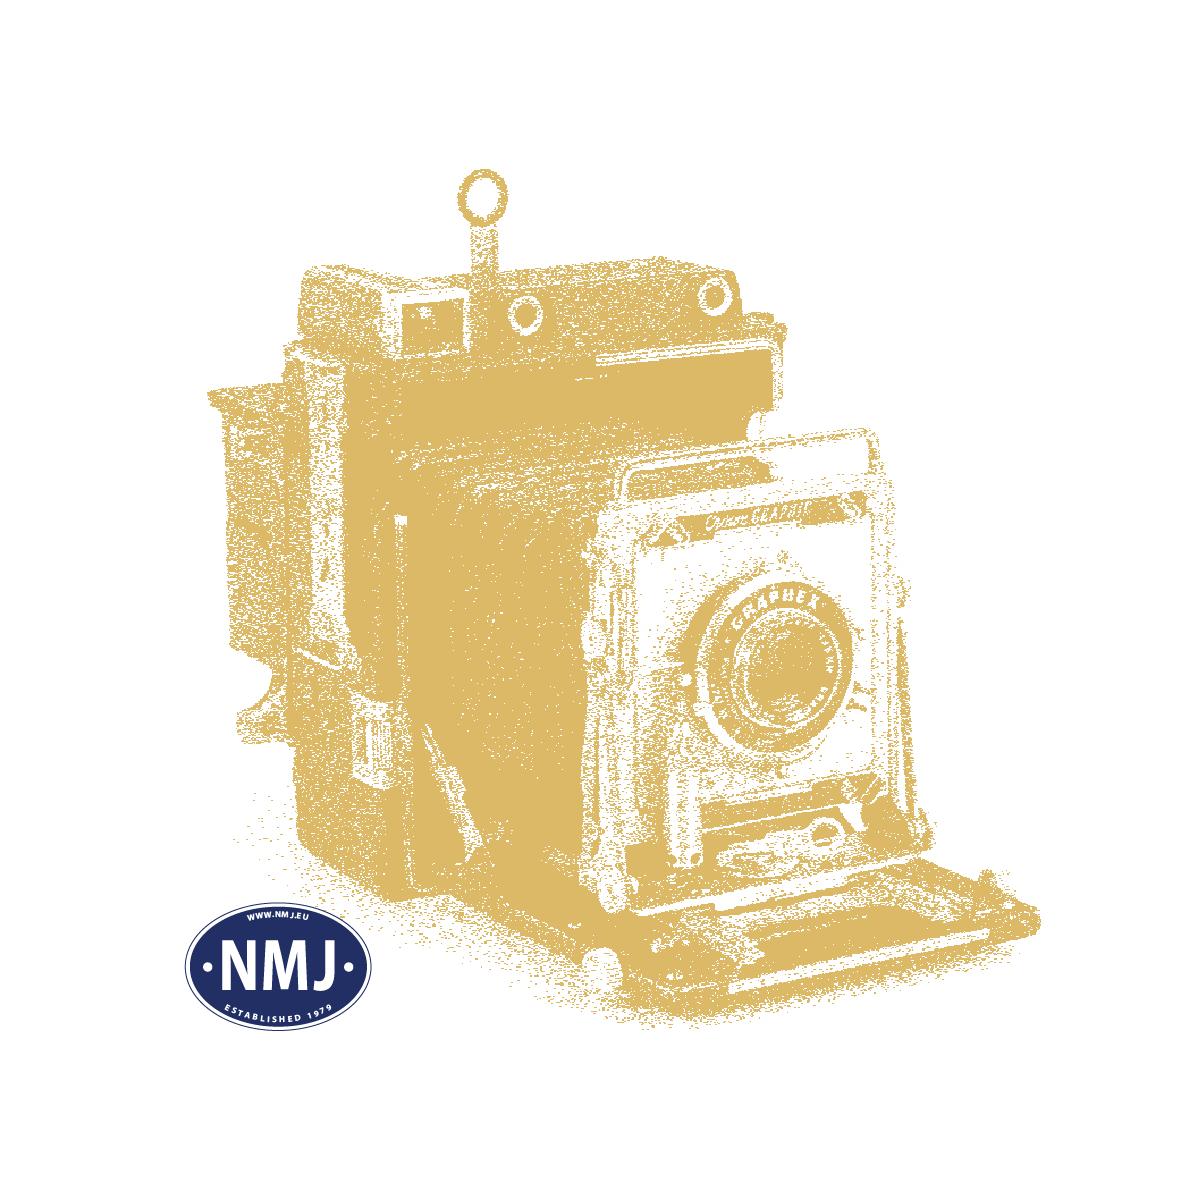 NMJT145002 - NMJ Topline NSB Di3.623 Red/Brown, 0-Scale